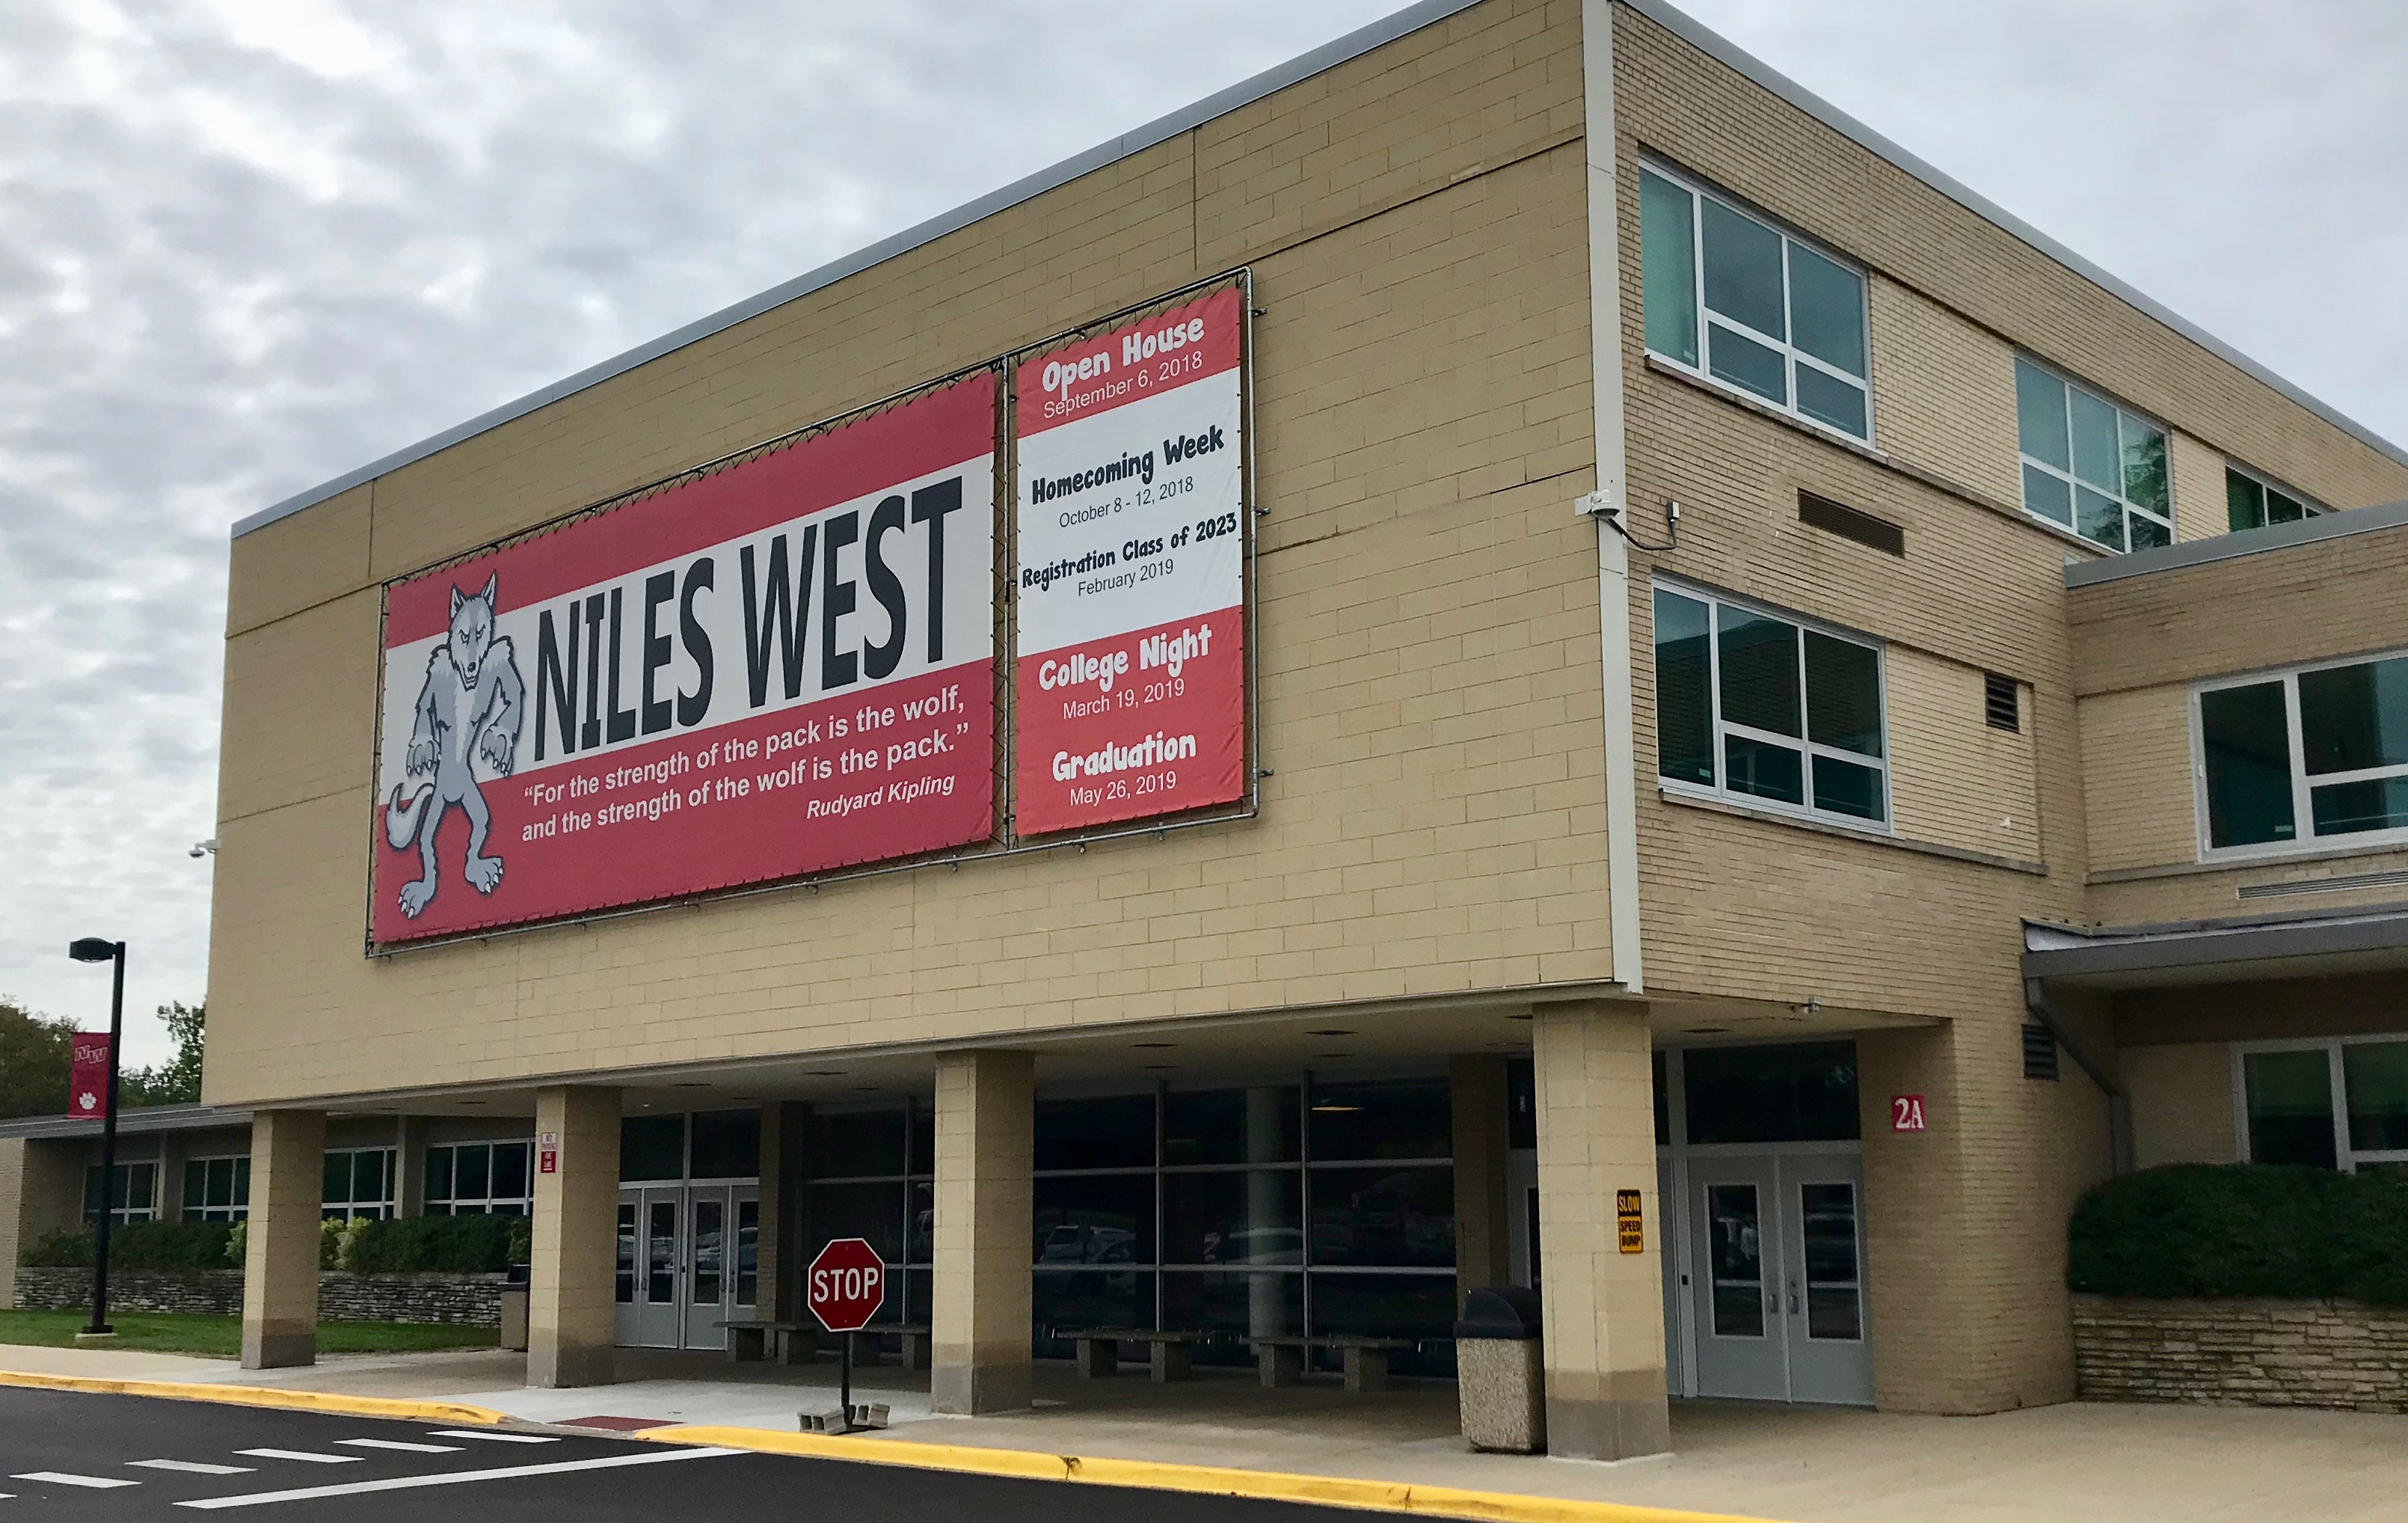 Niles West Highschool, Skokie, IL